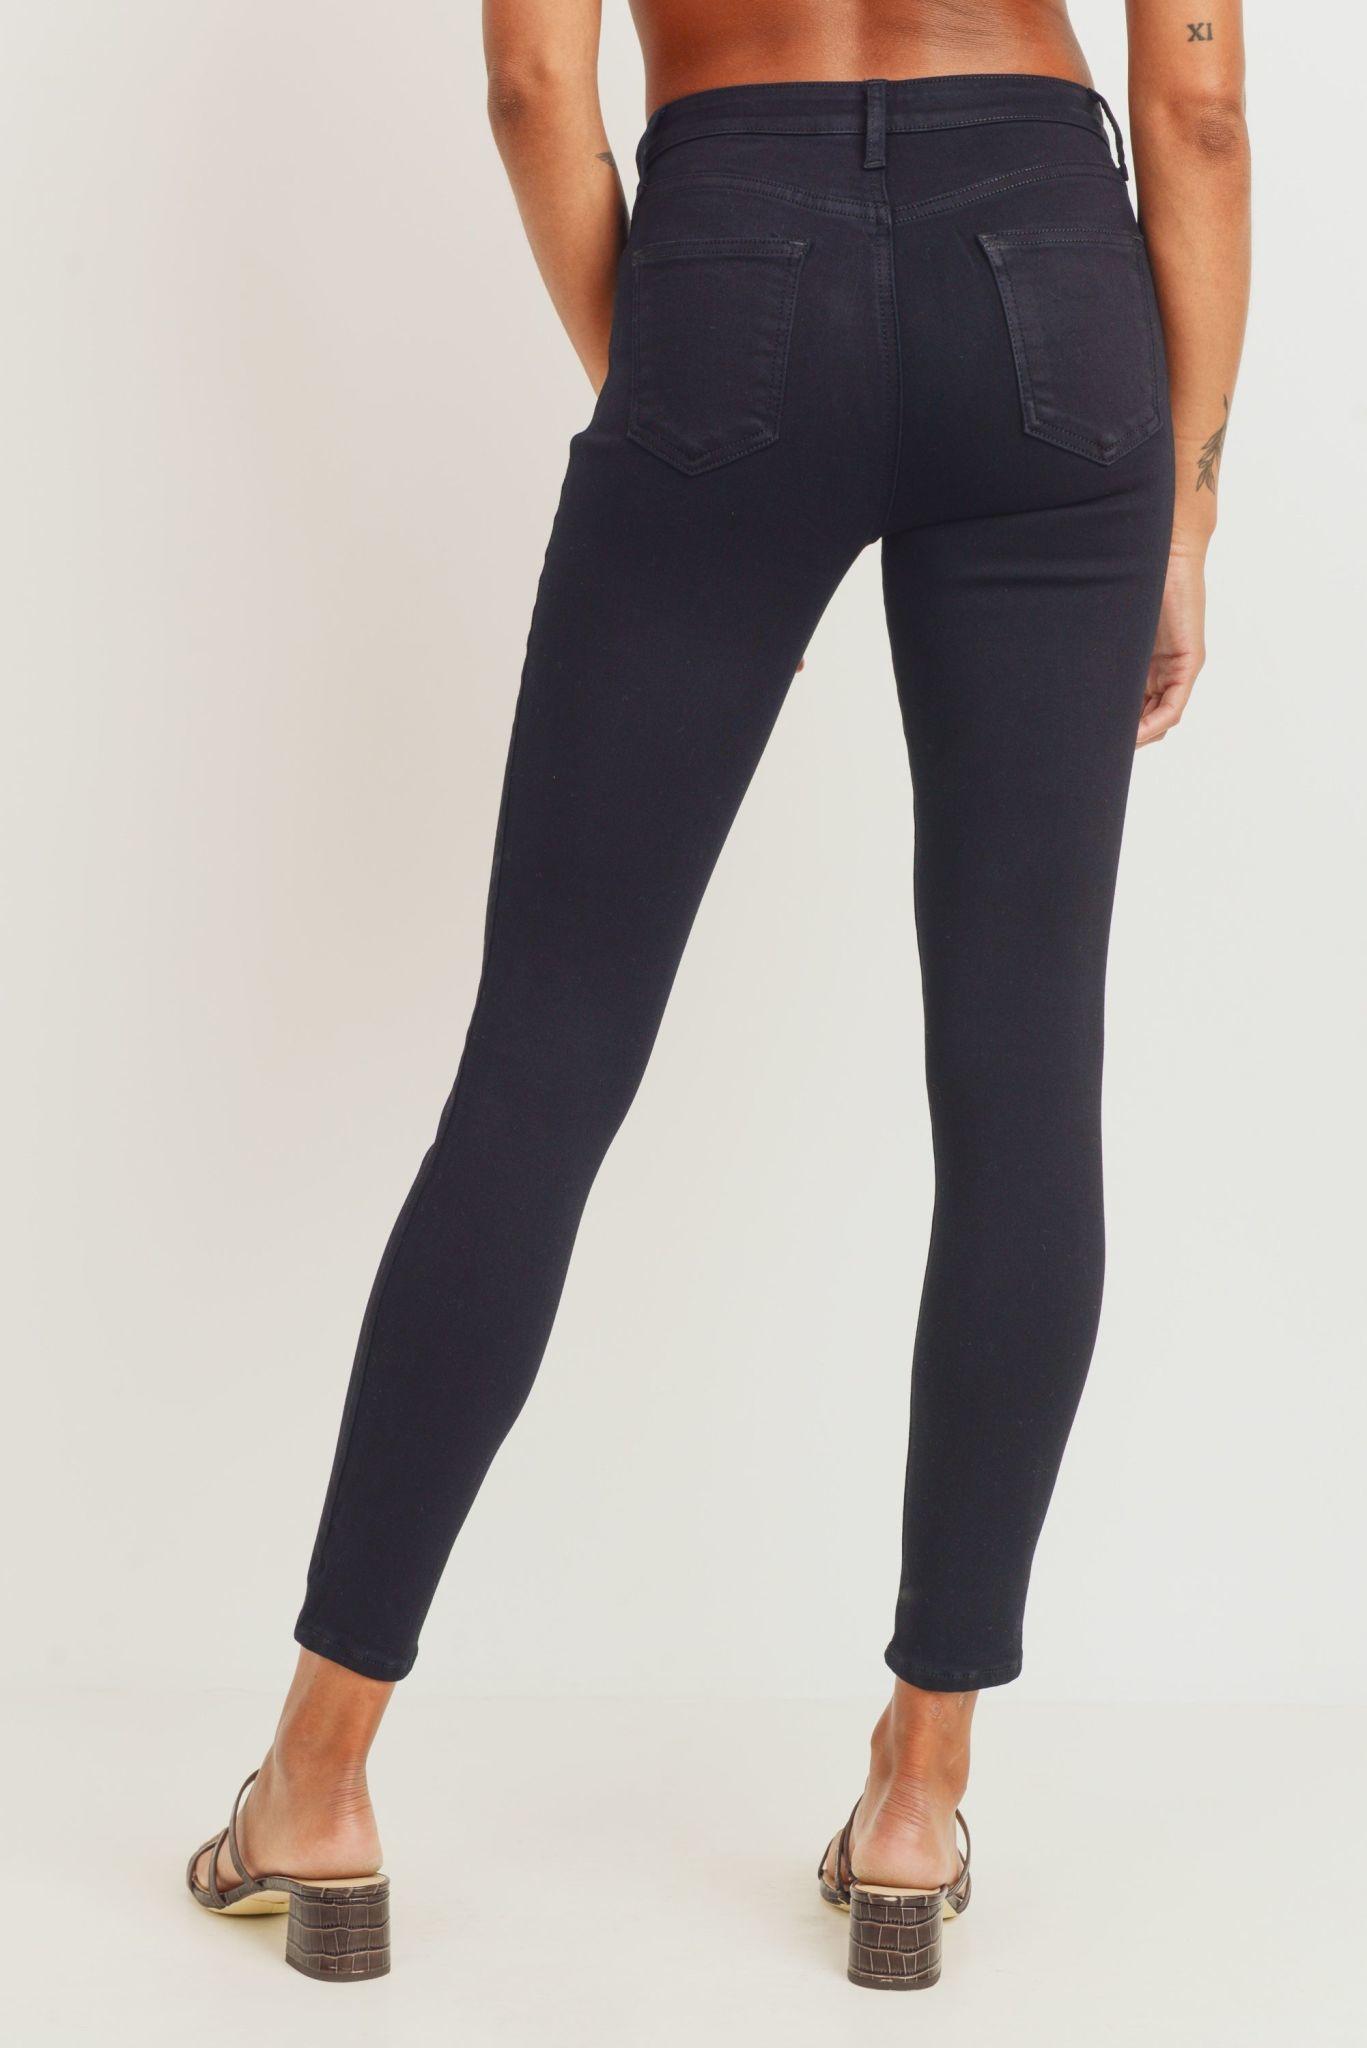 Five Pocket Classic Skinny Jean